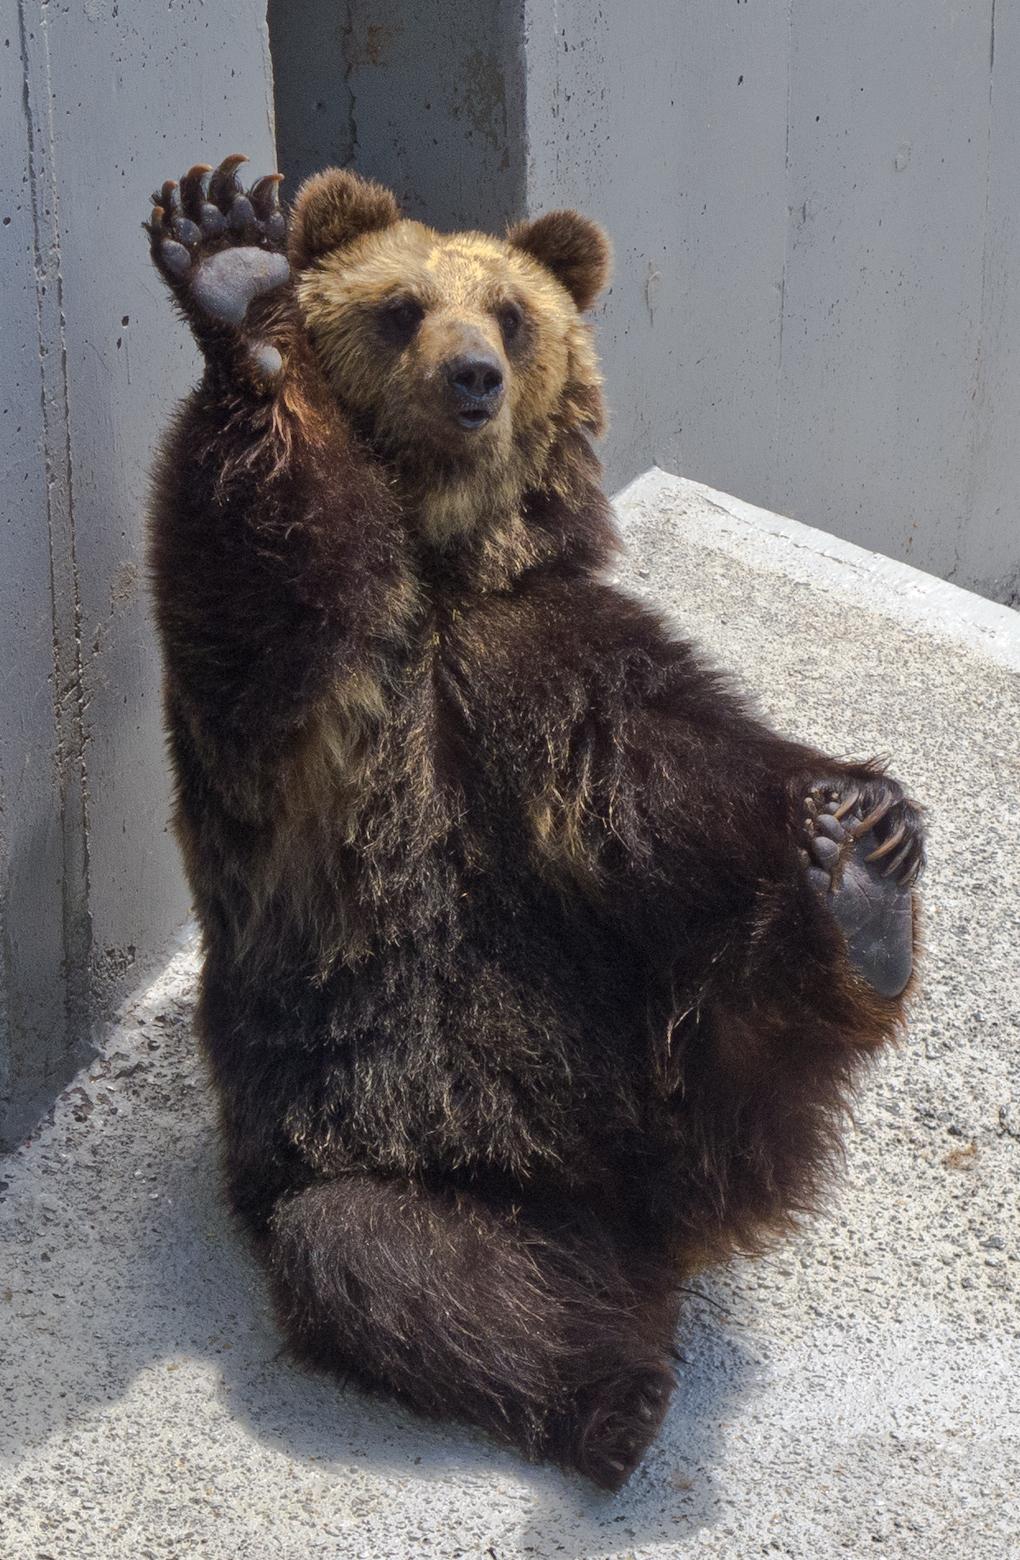 bear what